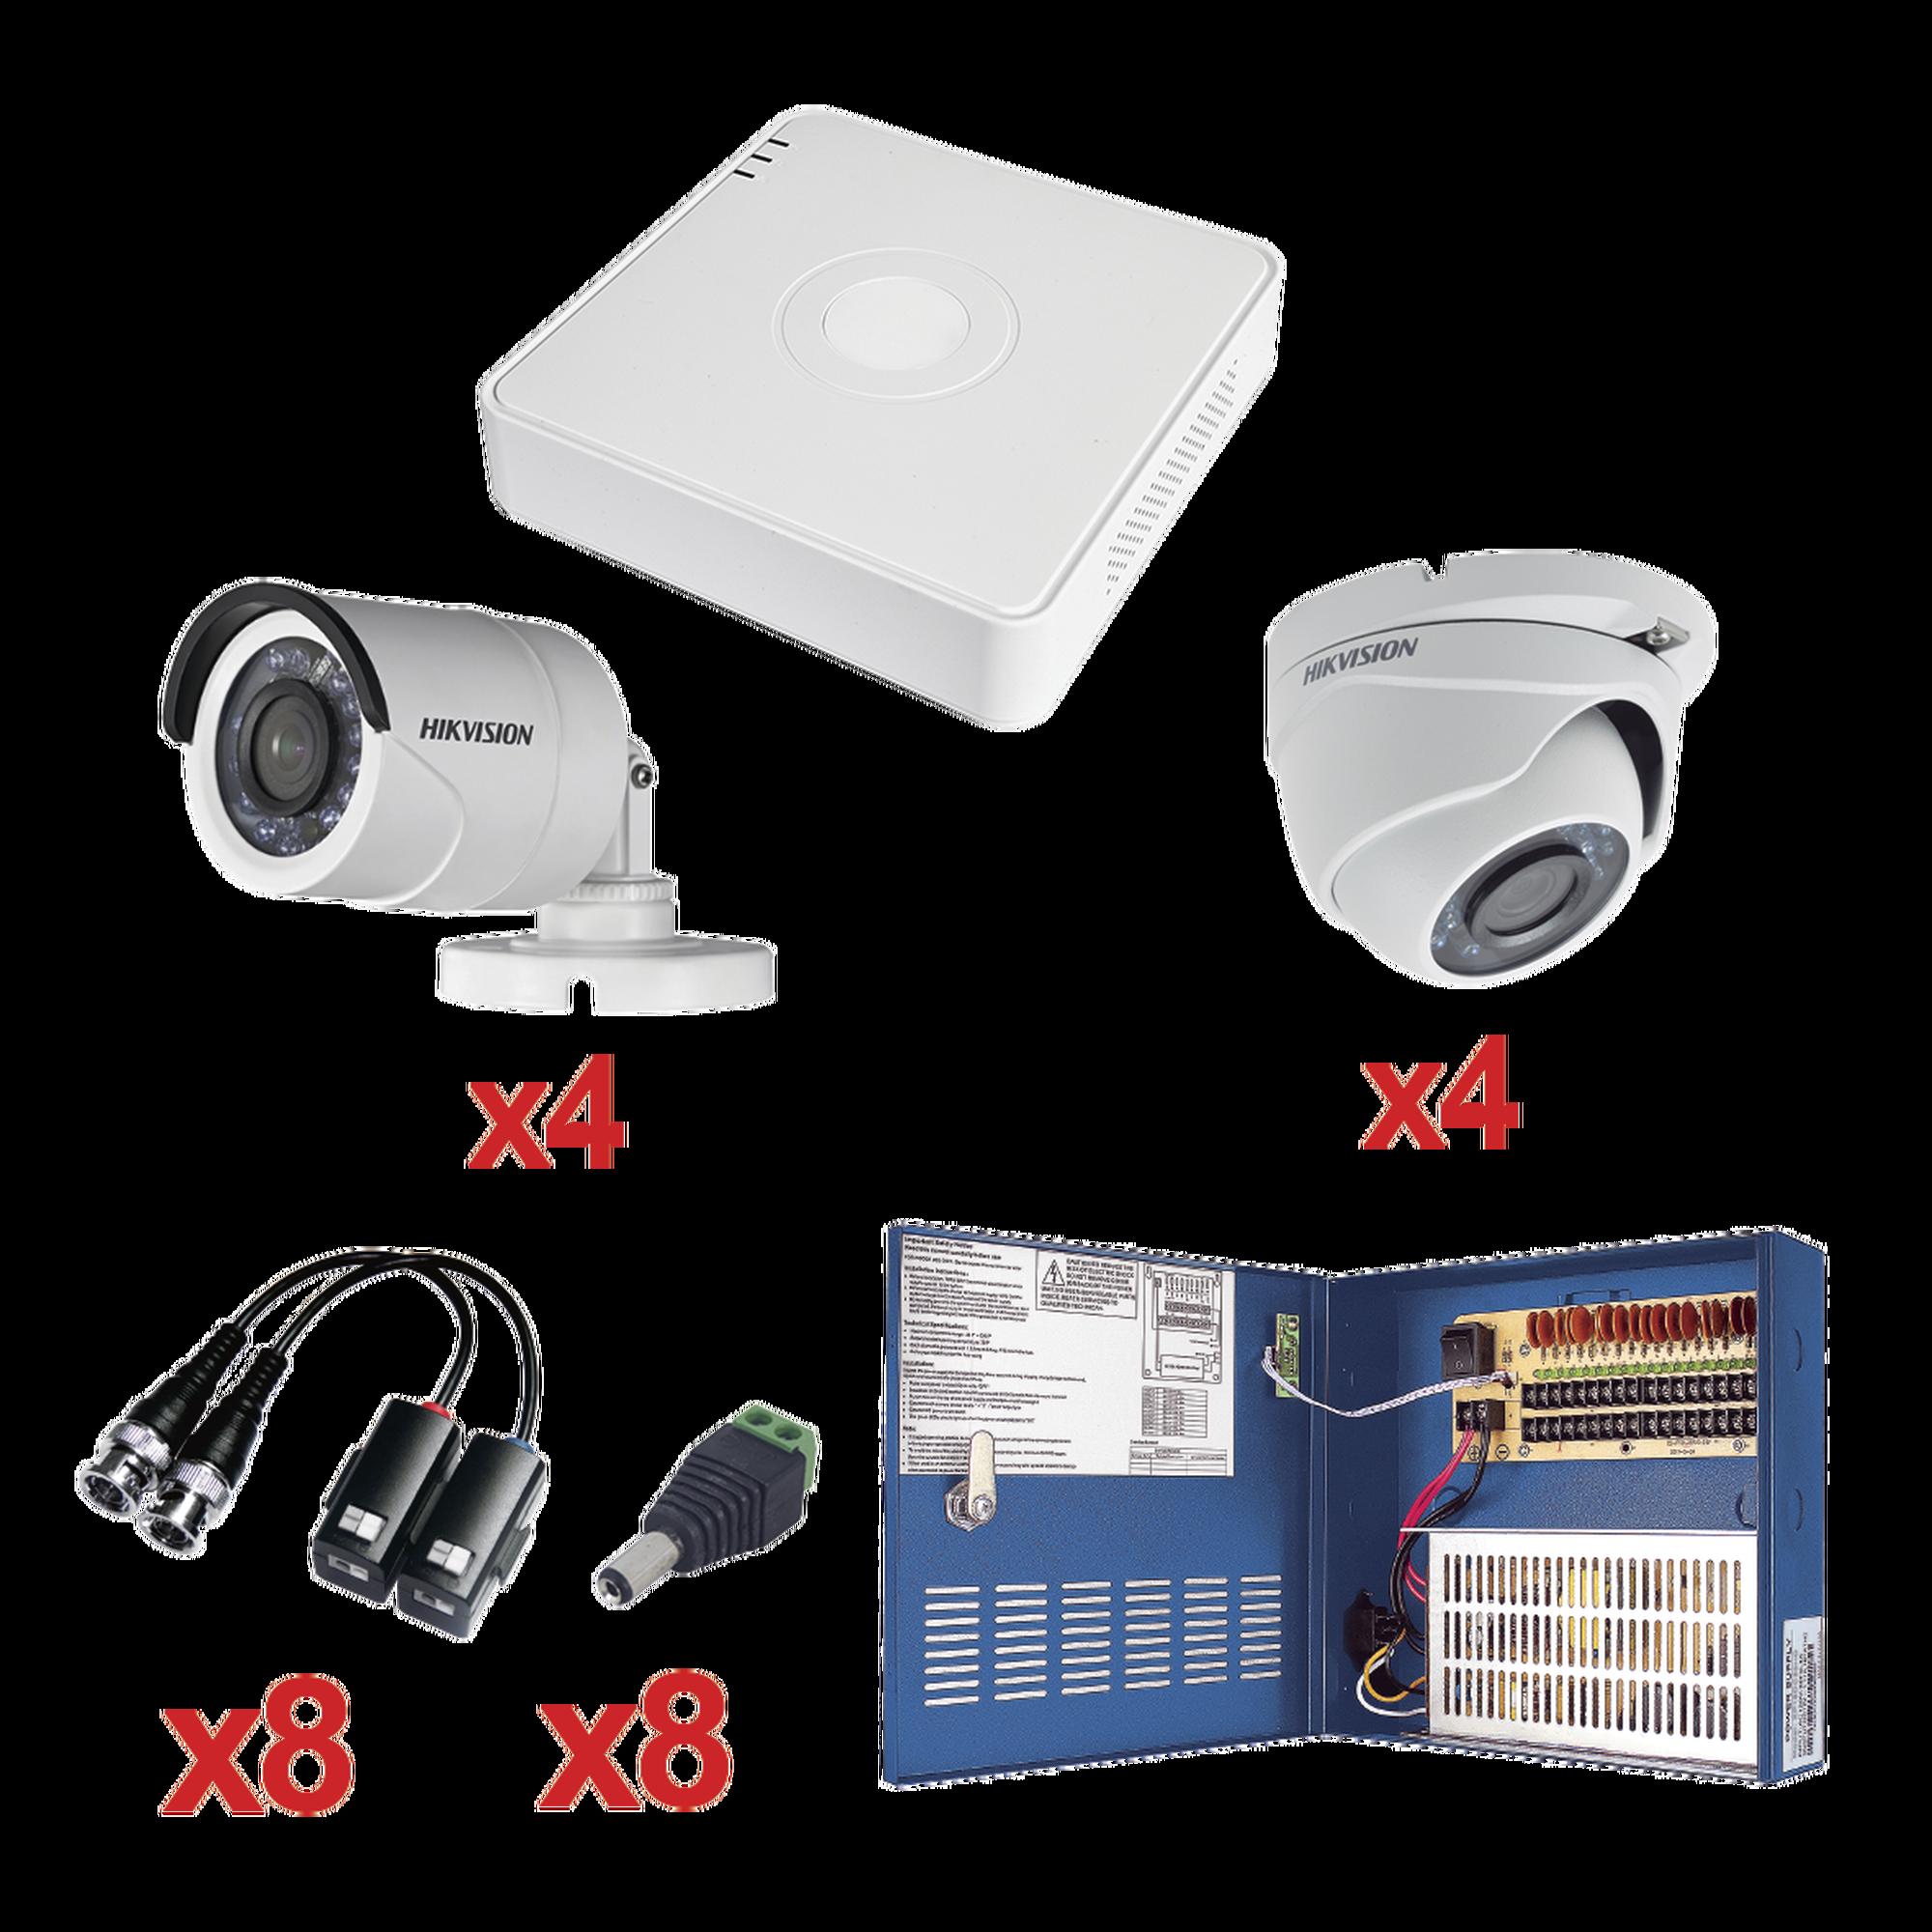 Sistema HIKVISION TURBOHD 720p / Incluye DVR 8 Ch / 4 Cámaras Bala 3.6 mm / 4 Cámaras Eyeball 2.8 mm / Transceptores / Conectores / Fuente de Poder Profesional hasta 15 Vcd para Larga Distancias